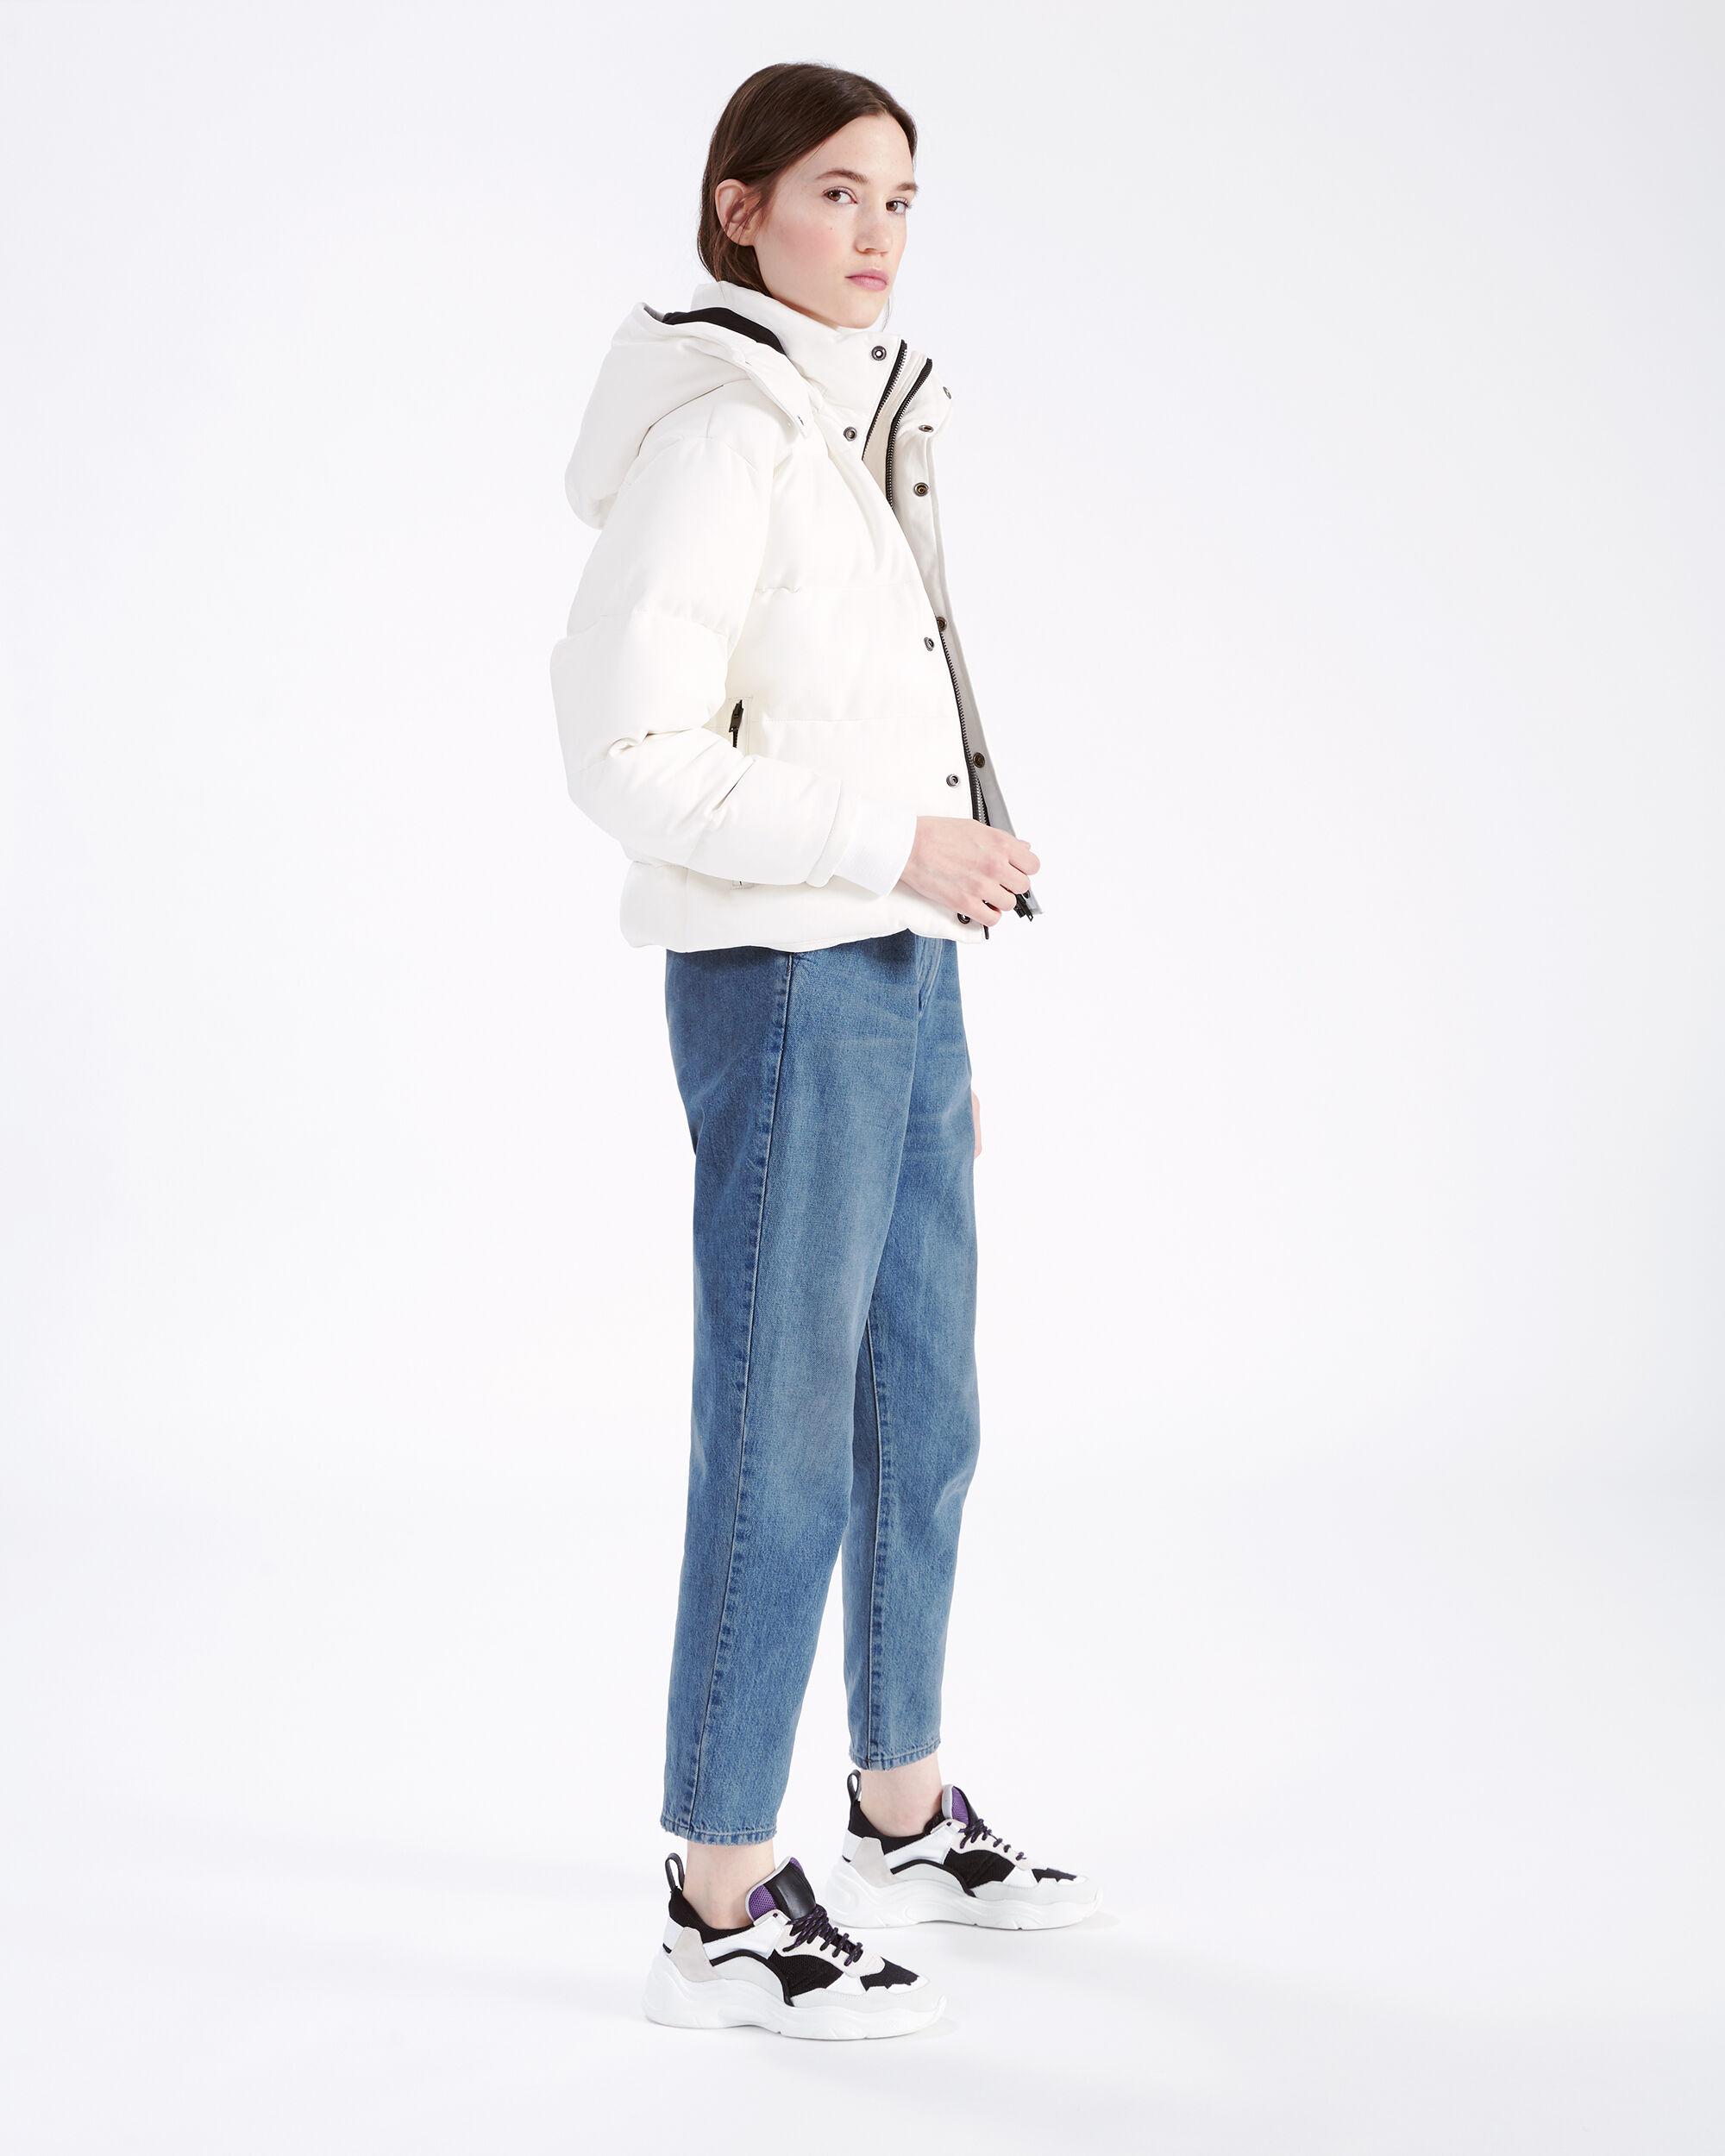 Iro Woman Flat White Size 37 Iro nPfiKx